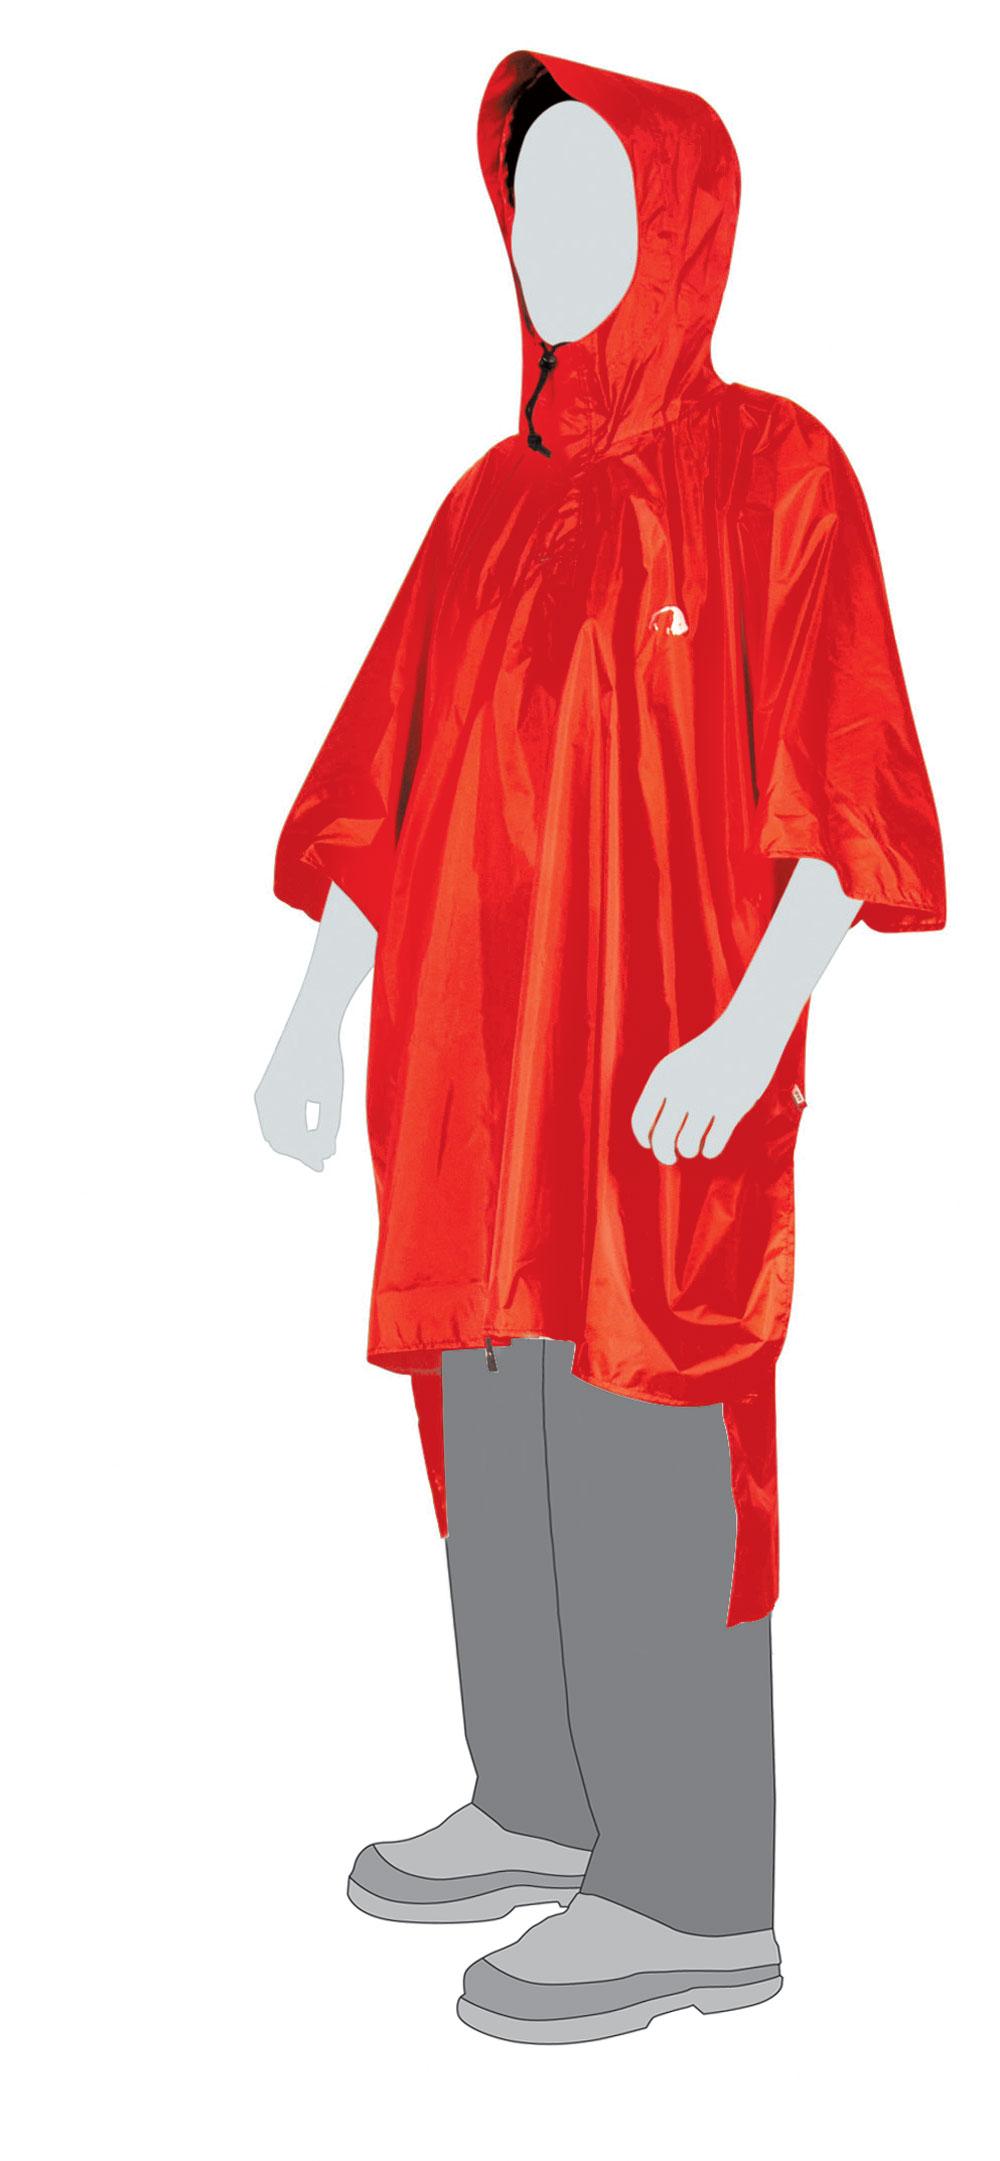 Плащ-накидка Poncho 1 XS-S, red, 2799.015, Плащи влагозащитные - арт. 266860332